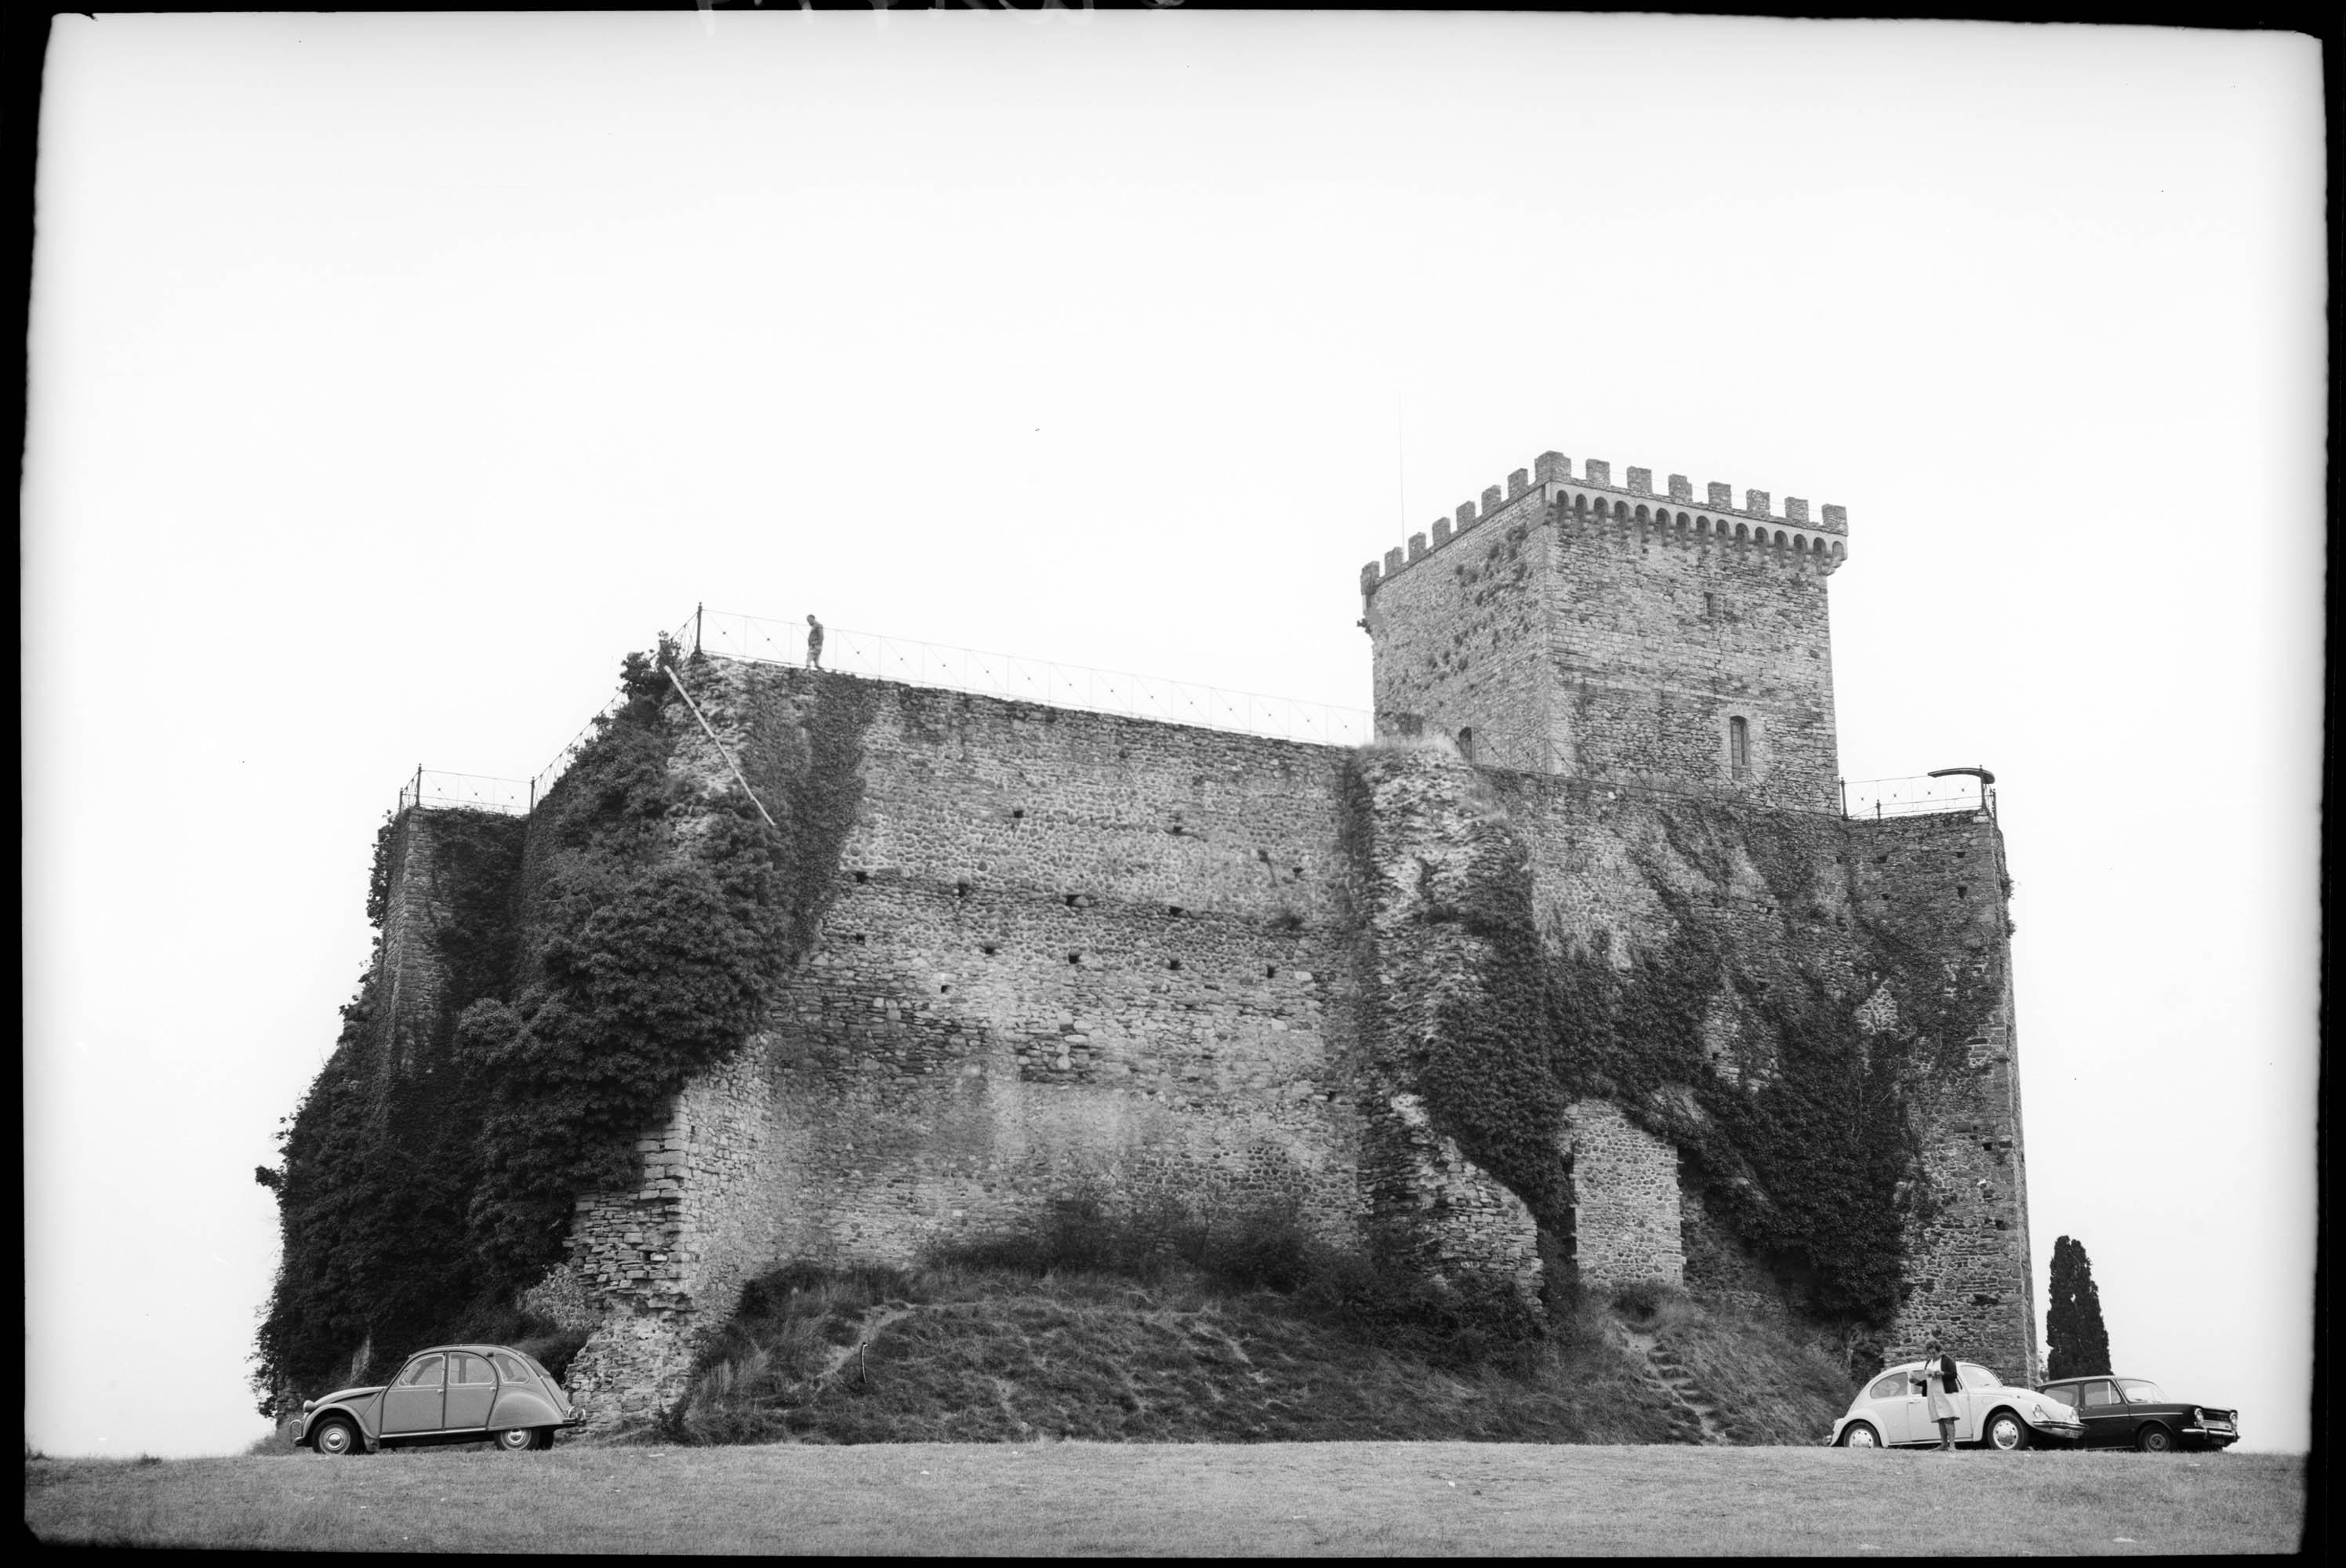 Ruines et donjon de Gaston Phoebus